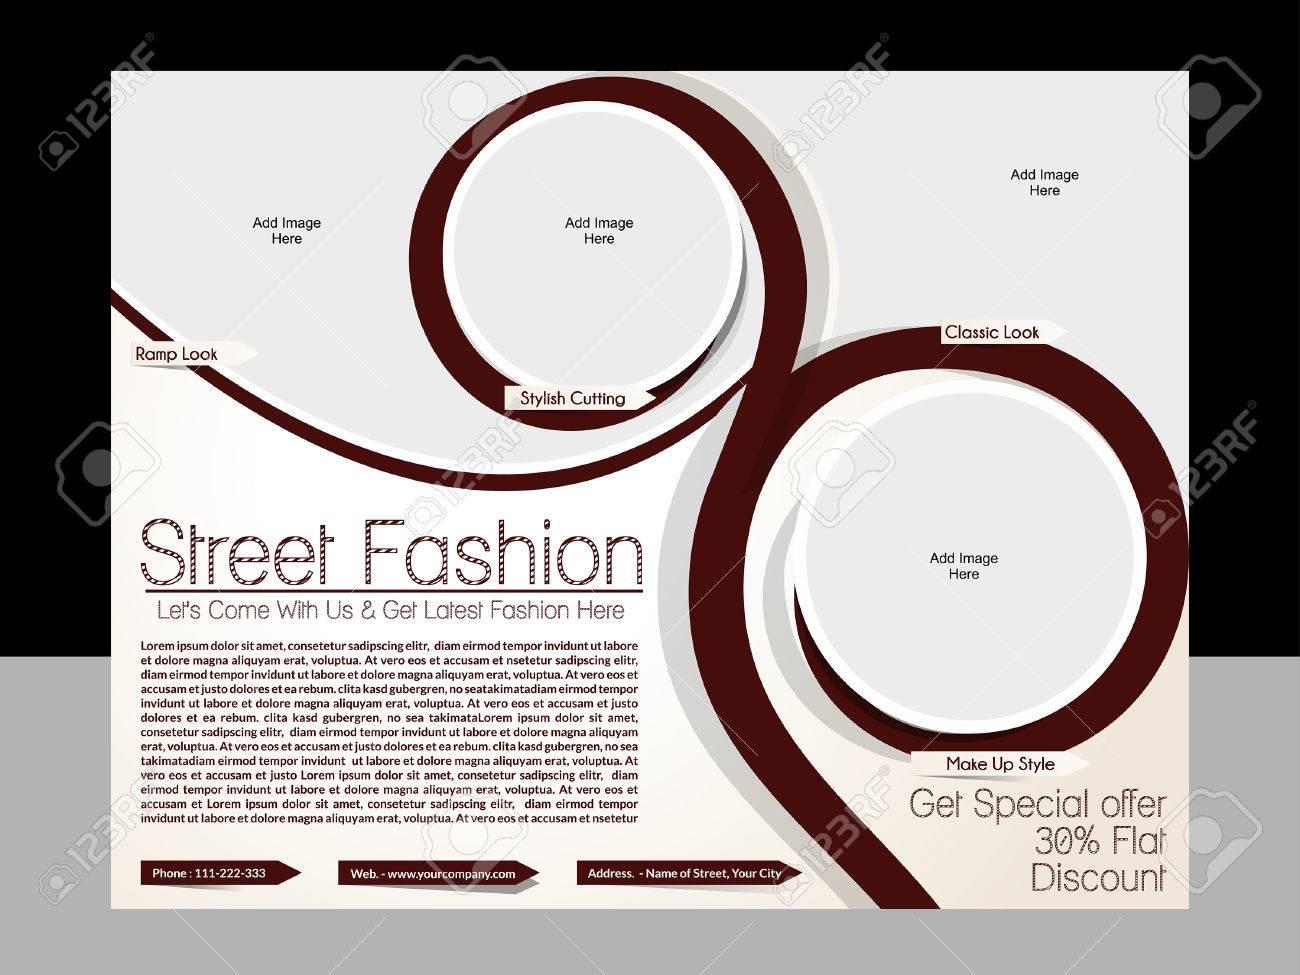 Street Fashion Flyer Template Vector Illustration Royalty Free ...